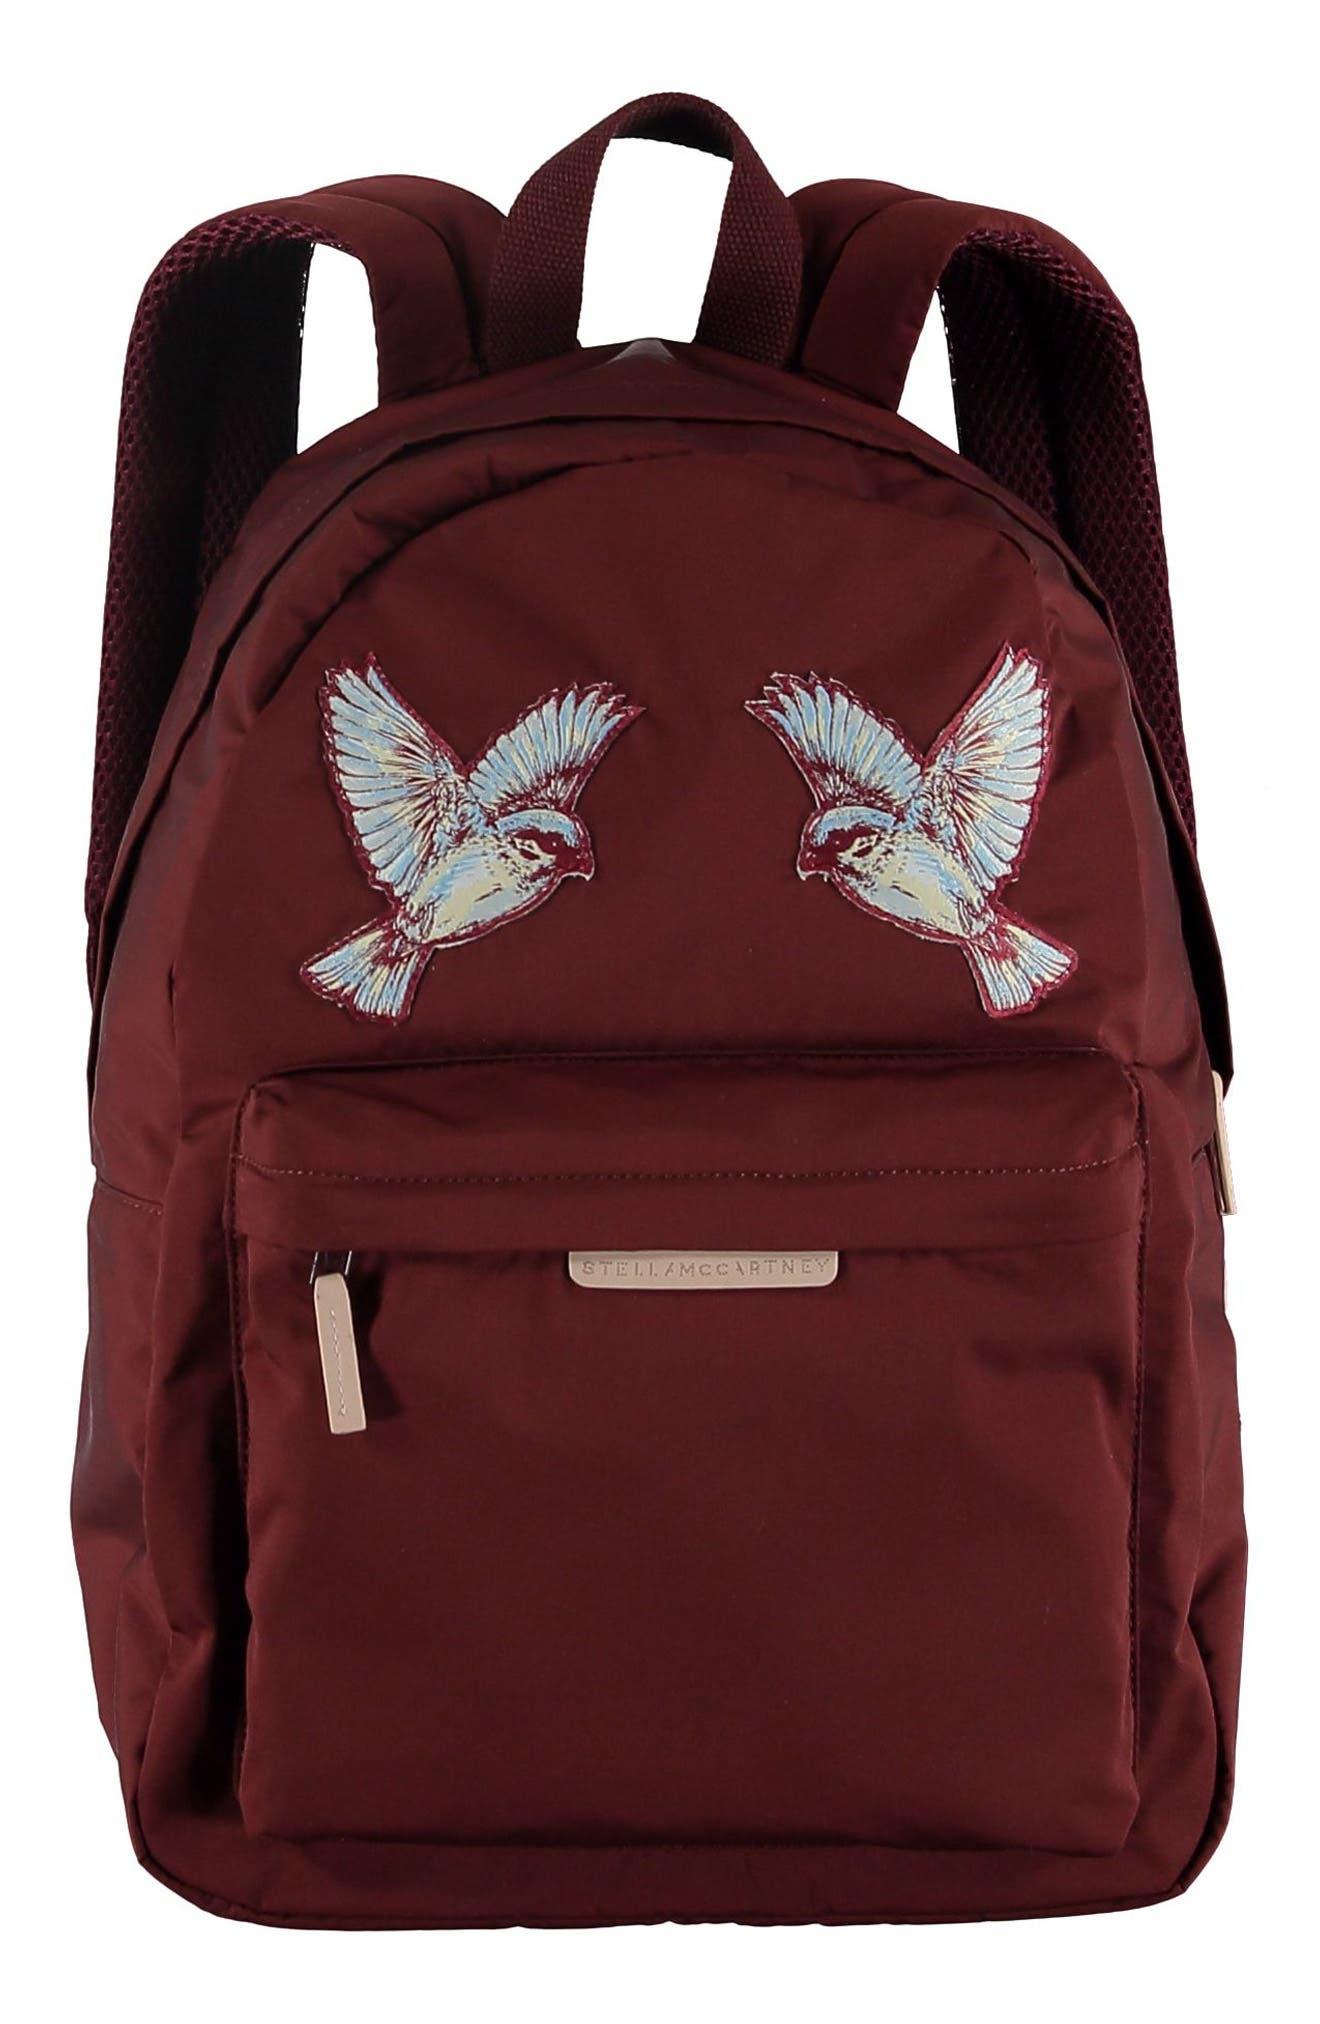 Girls Stella Mccartney Kids Hummingbird Applique Backpack  Burgundy